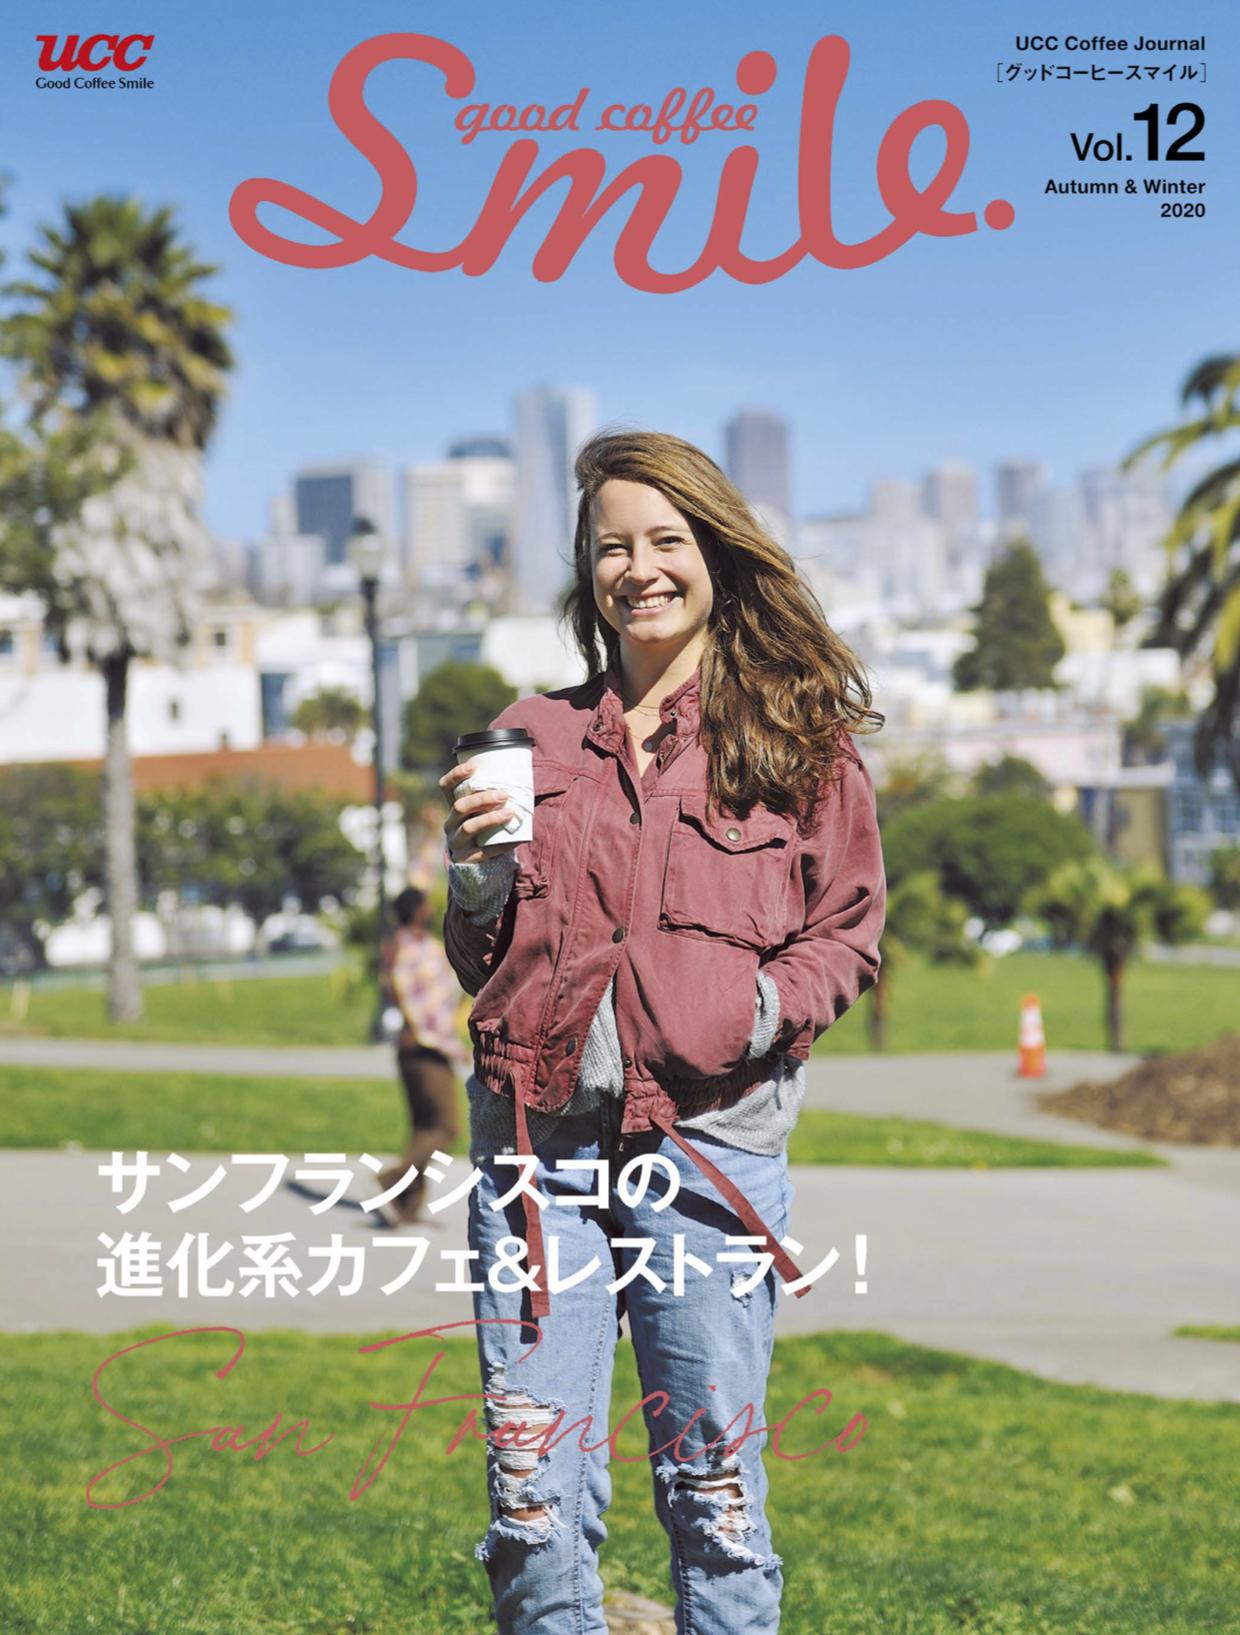 GOOD COFFEE SMILE